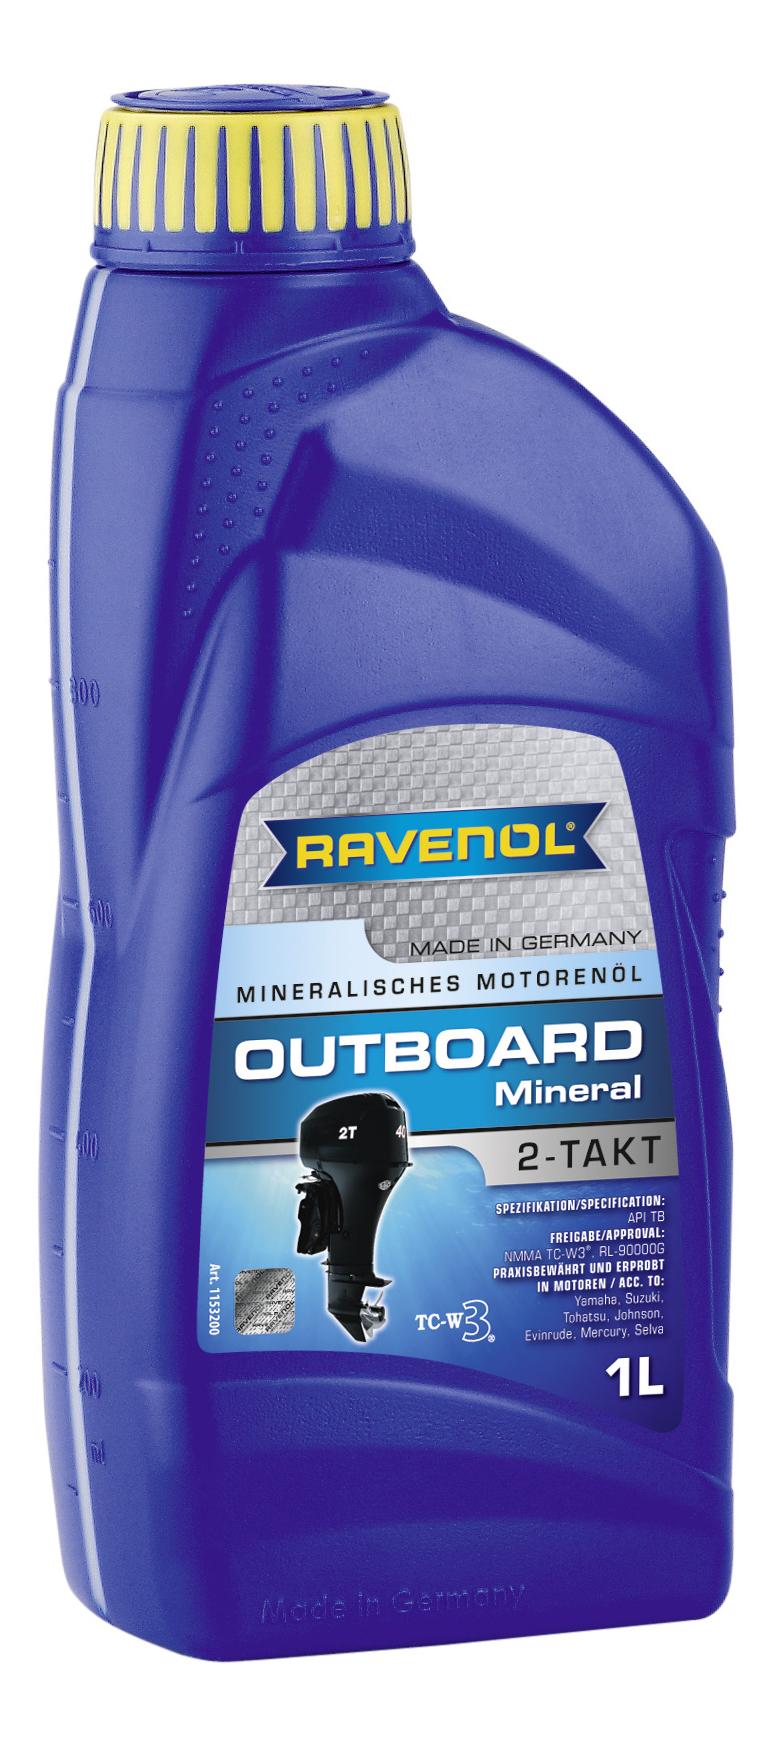 Ravenol Outboard 2T Teilsynth, ,для 2-хтактных, полусинтетика,1л, Германия